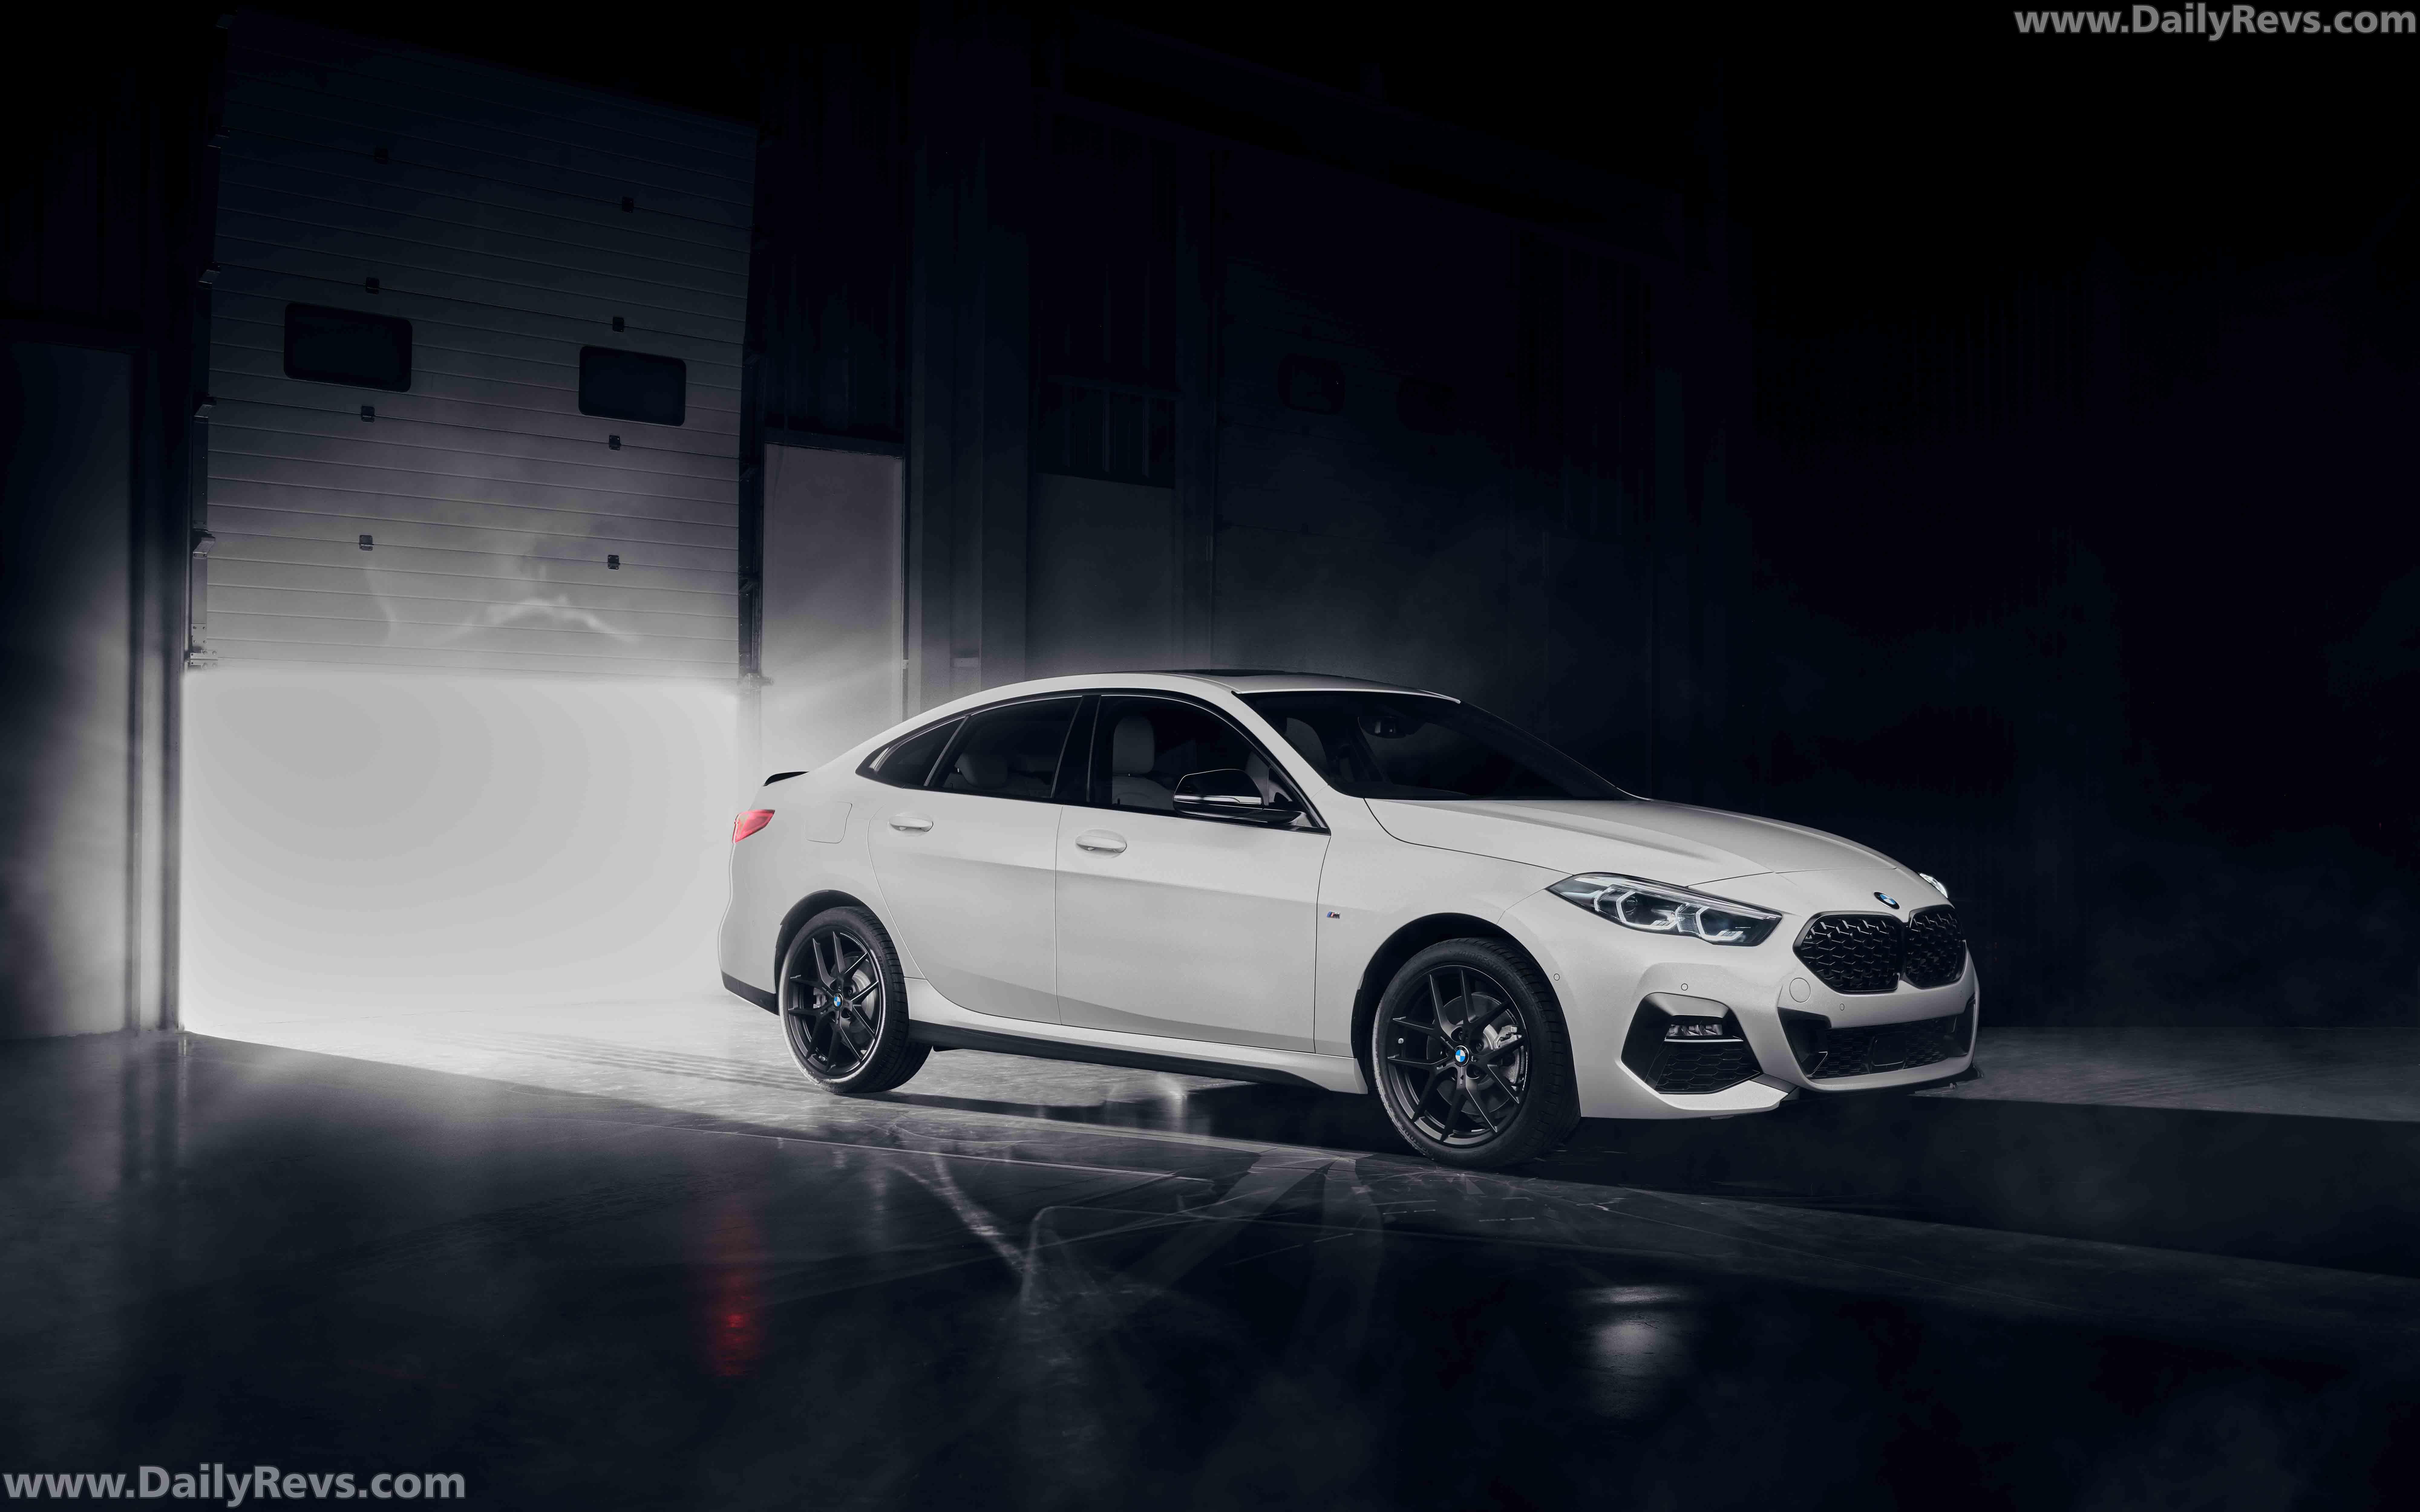 2020 BMW 2 Series Gran Coupe Black Shadow full